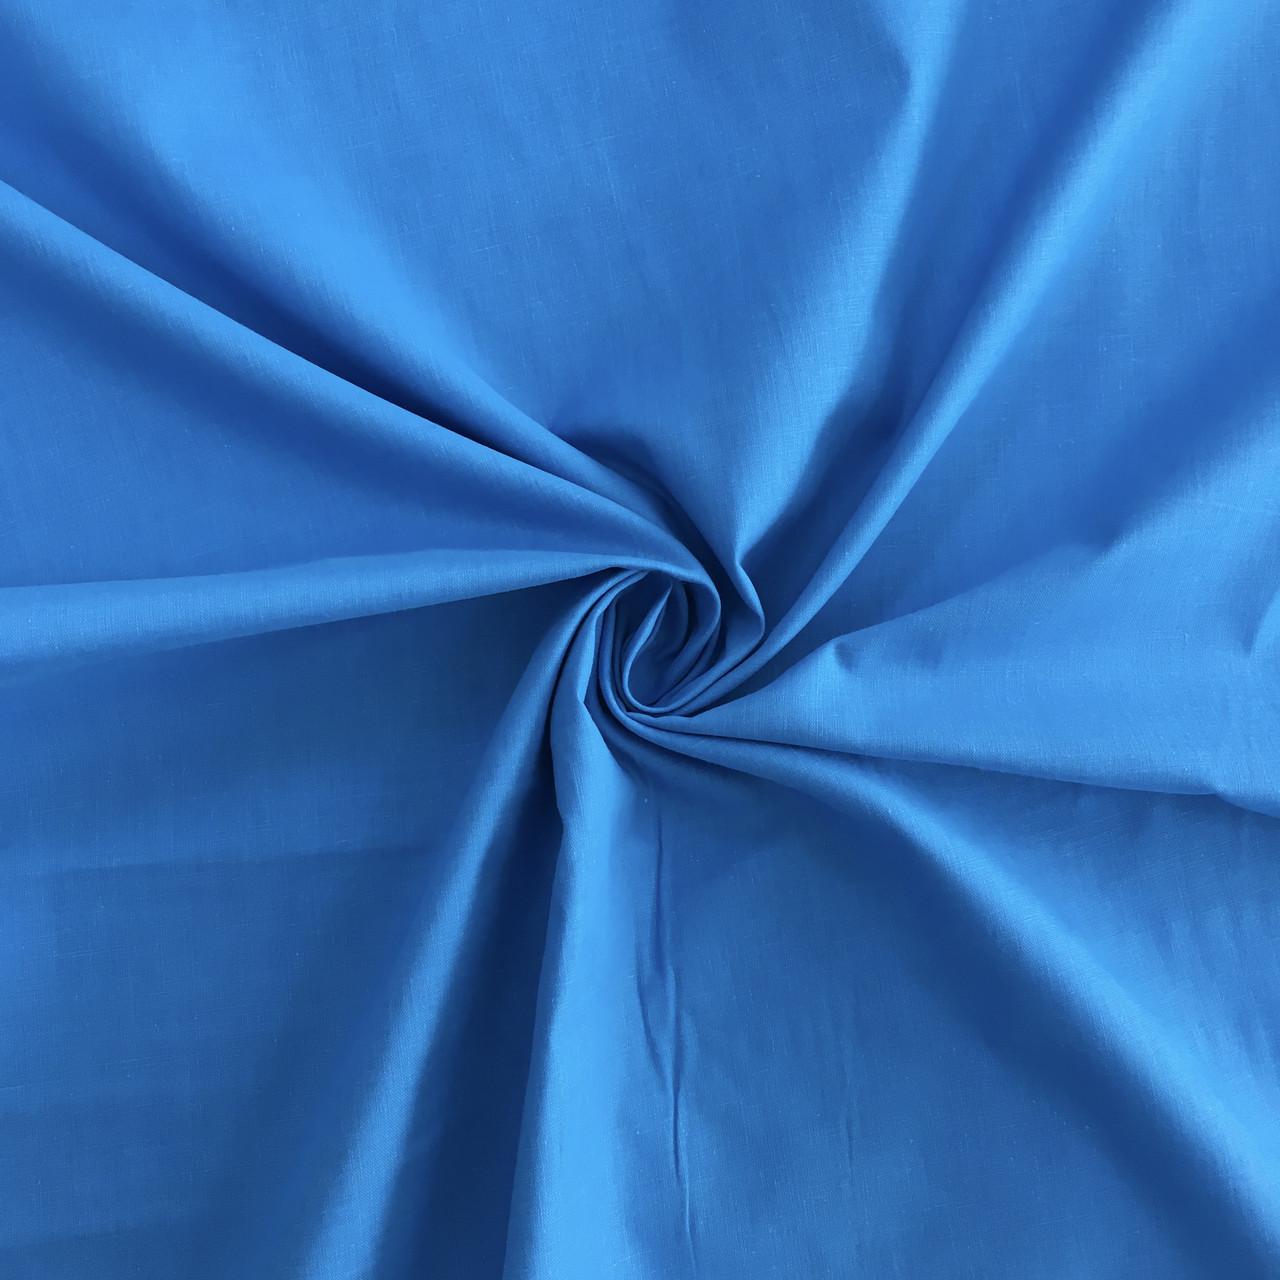 Польская хлопковая ткань лазурная 160 см